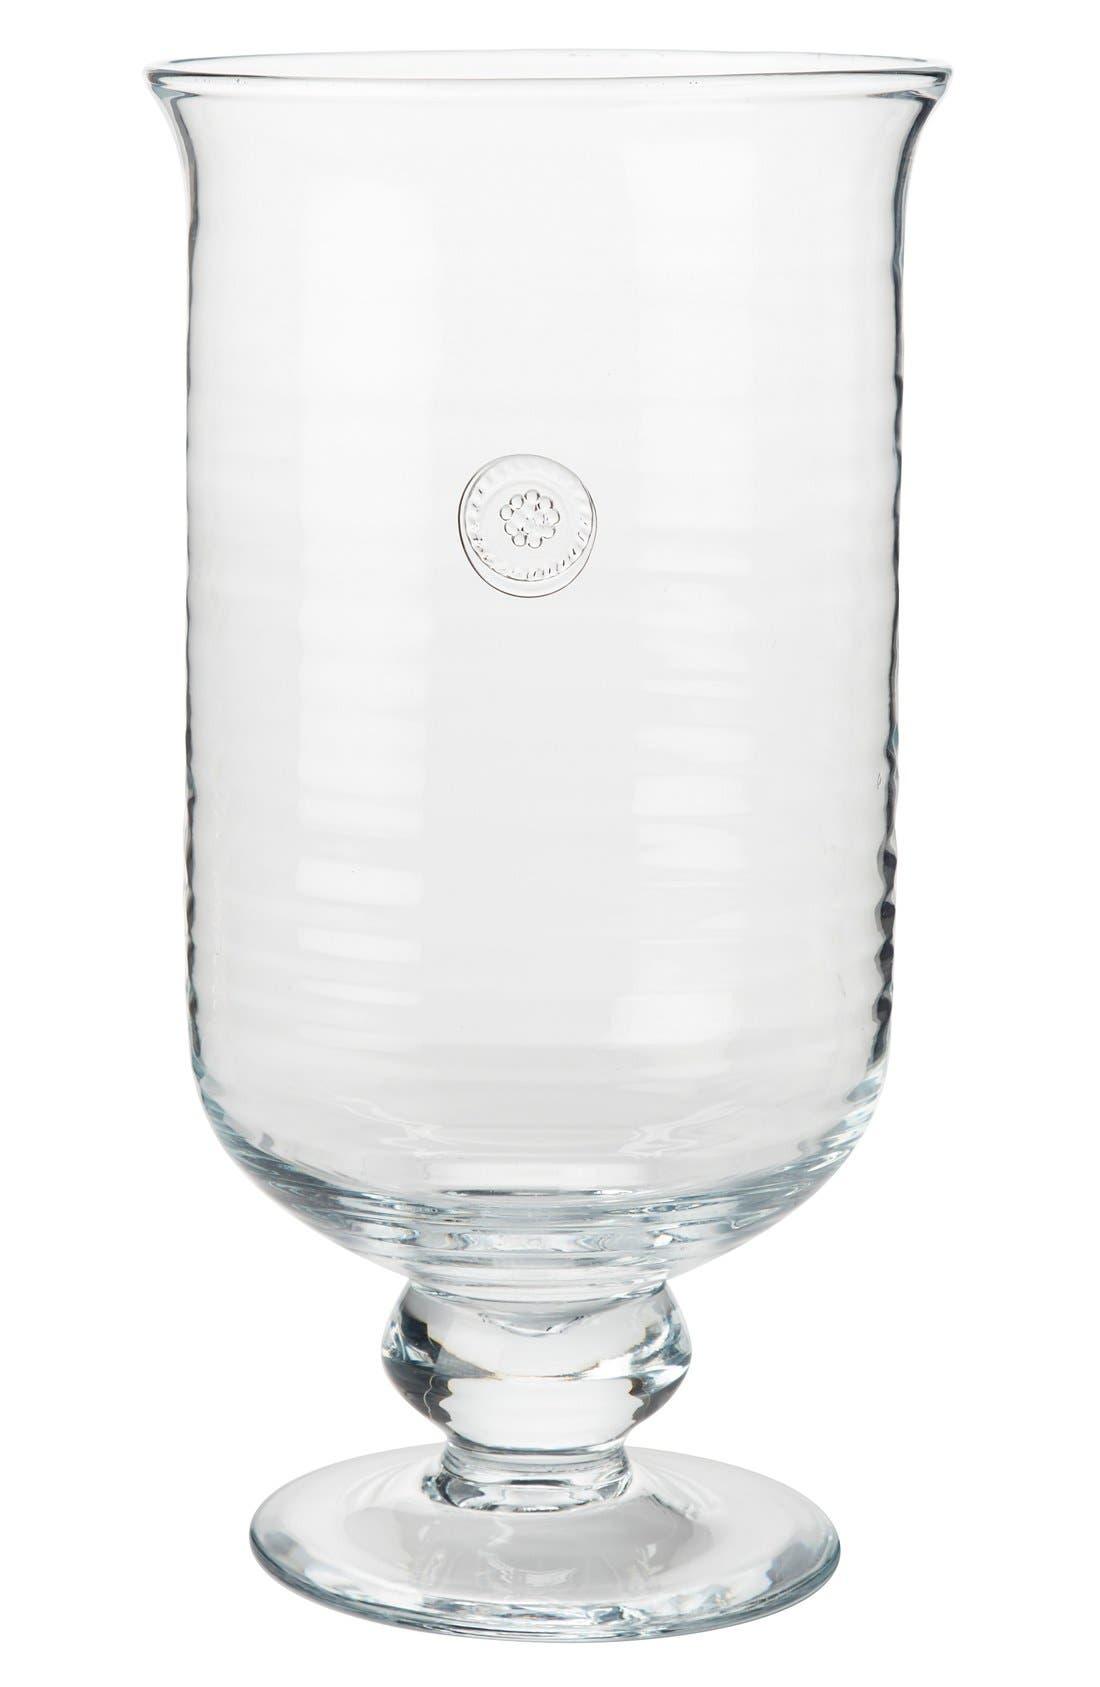 Main Image - Juliska Berry & Thread Large Hurricane Glass Candle Holder